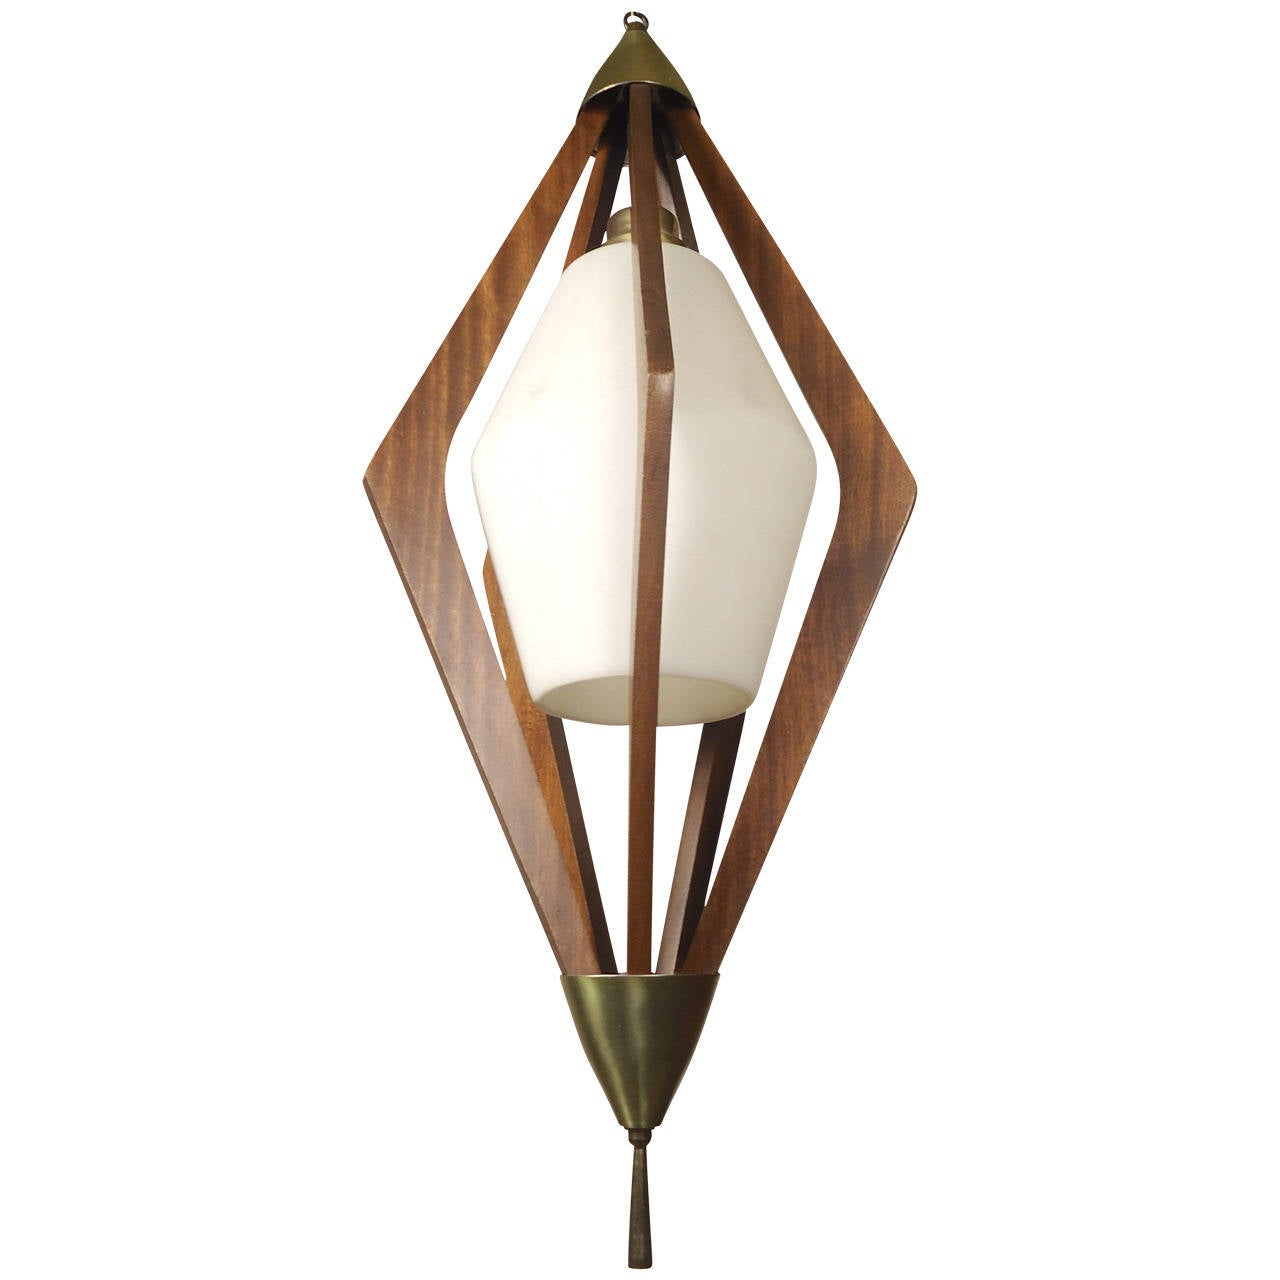 Mid century modern hanging pendant at 1stdibs for Mid century modern hanging lamp